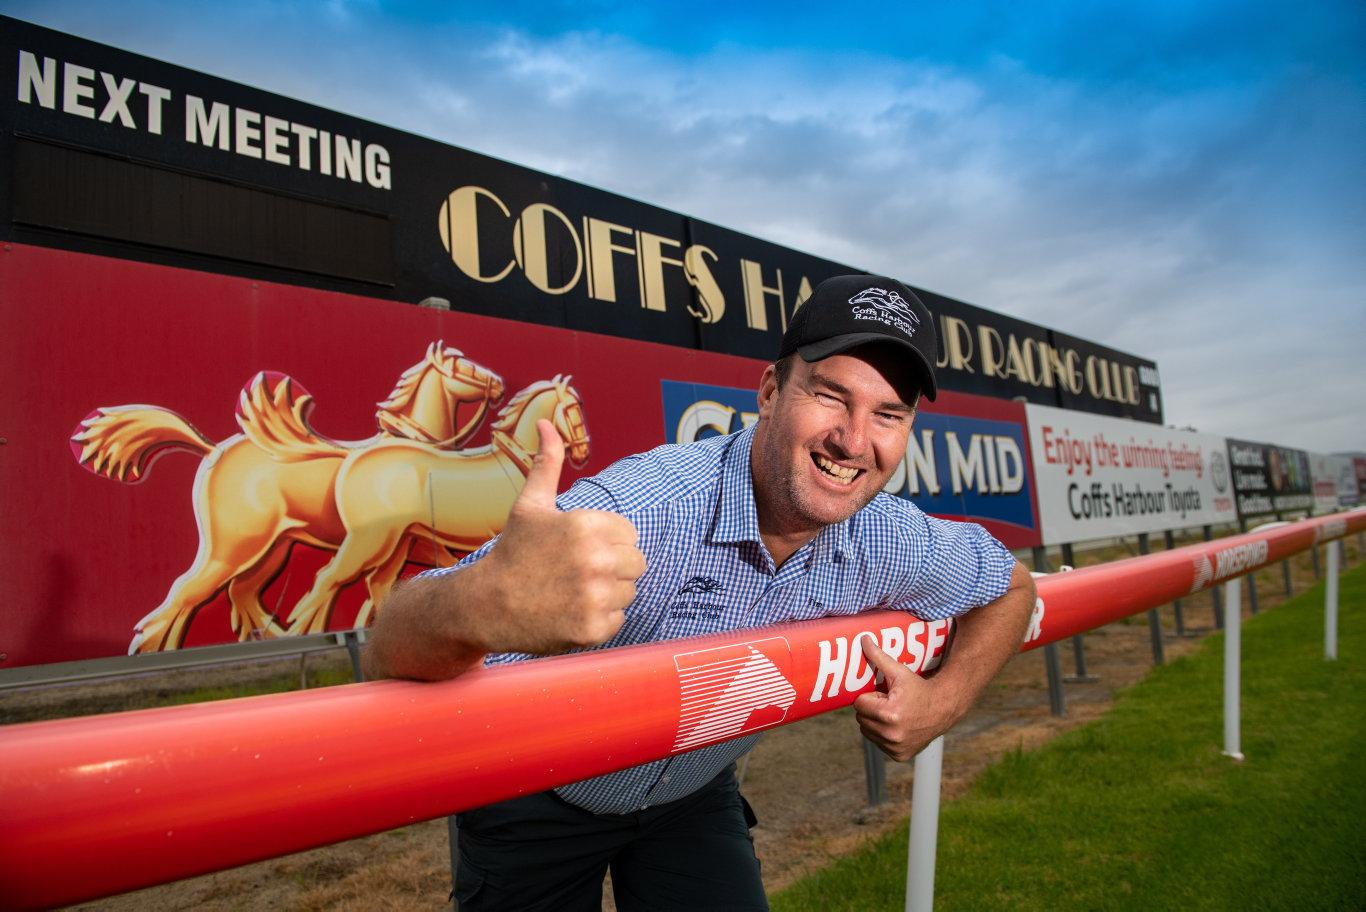 Coffs Harbour Racing Club chief executive officer Tim Saladine.